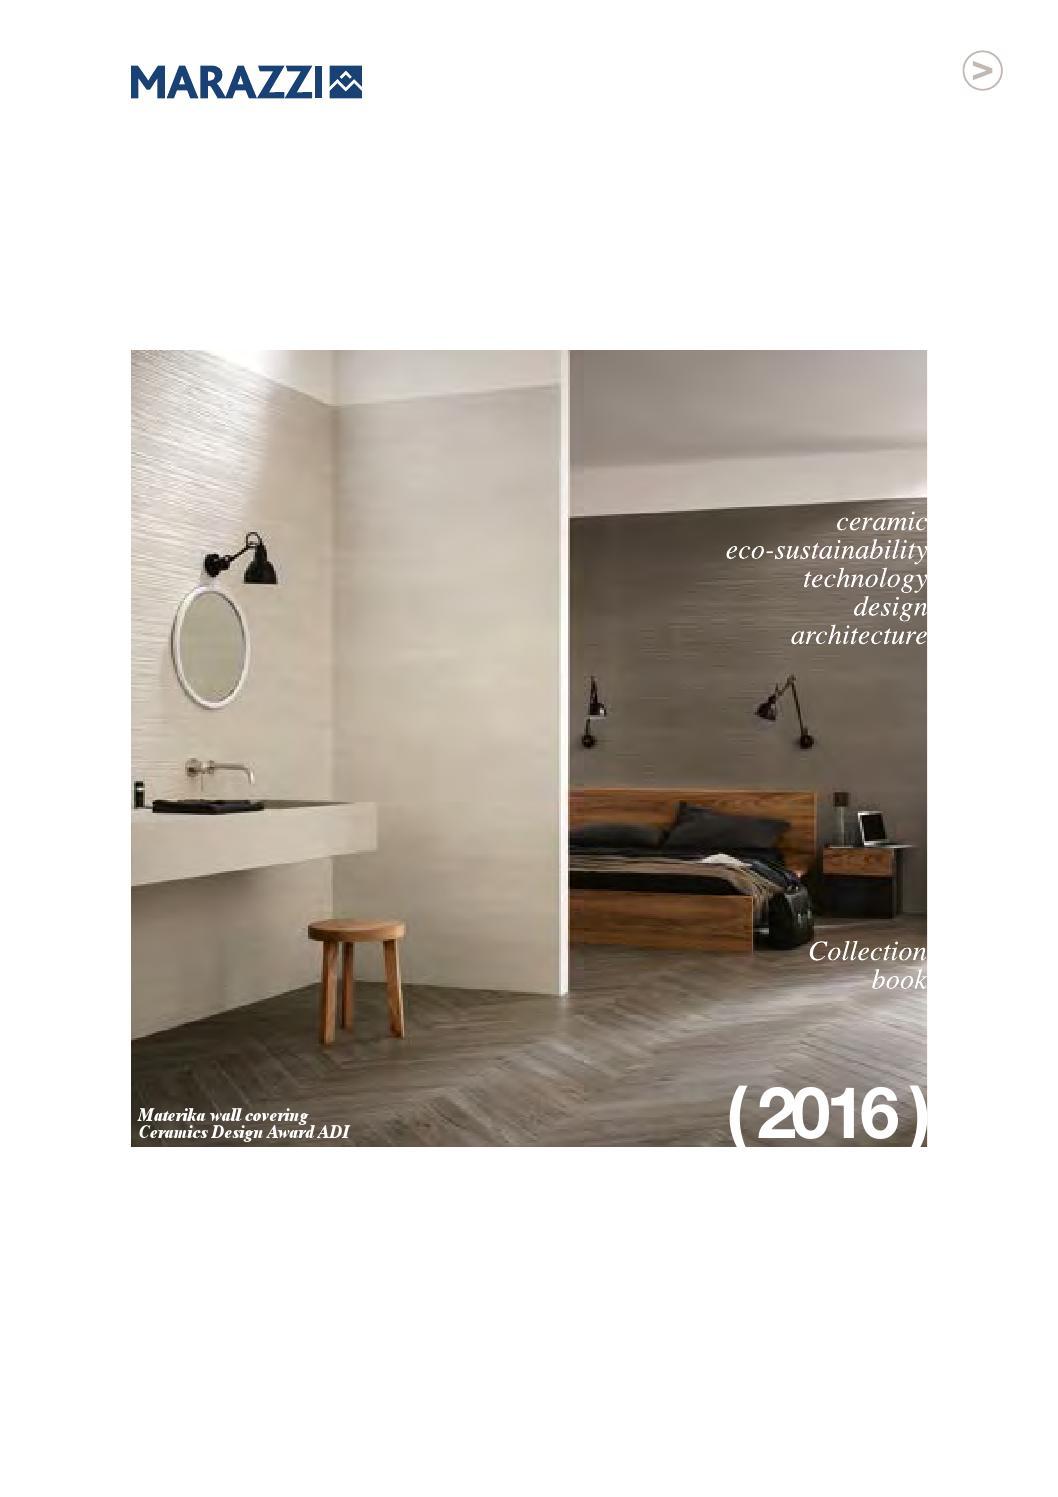 Marazzi Schemi Di Posa marazzi 2016 by iris - issuu